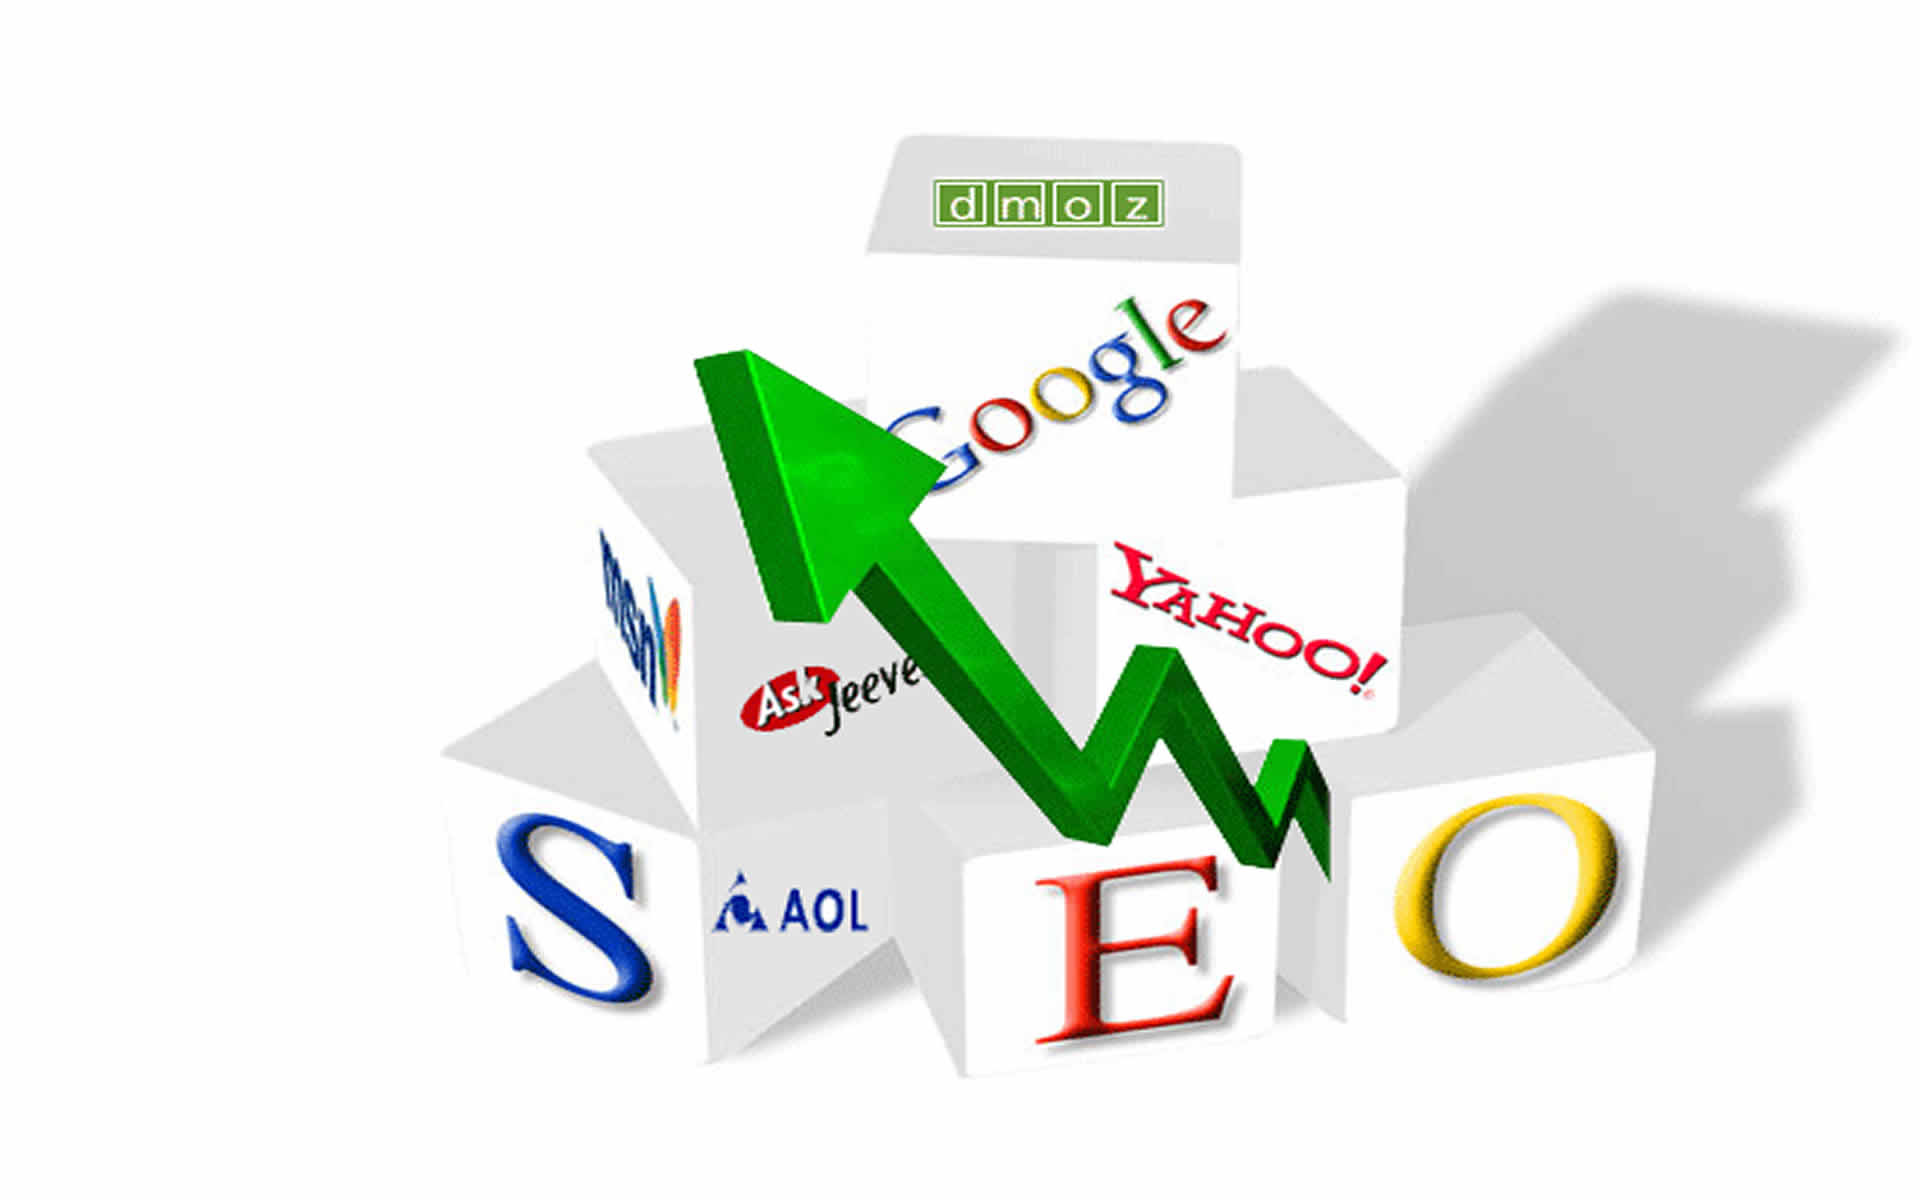 SEO - Google ranking help